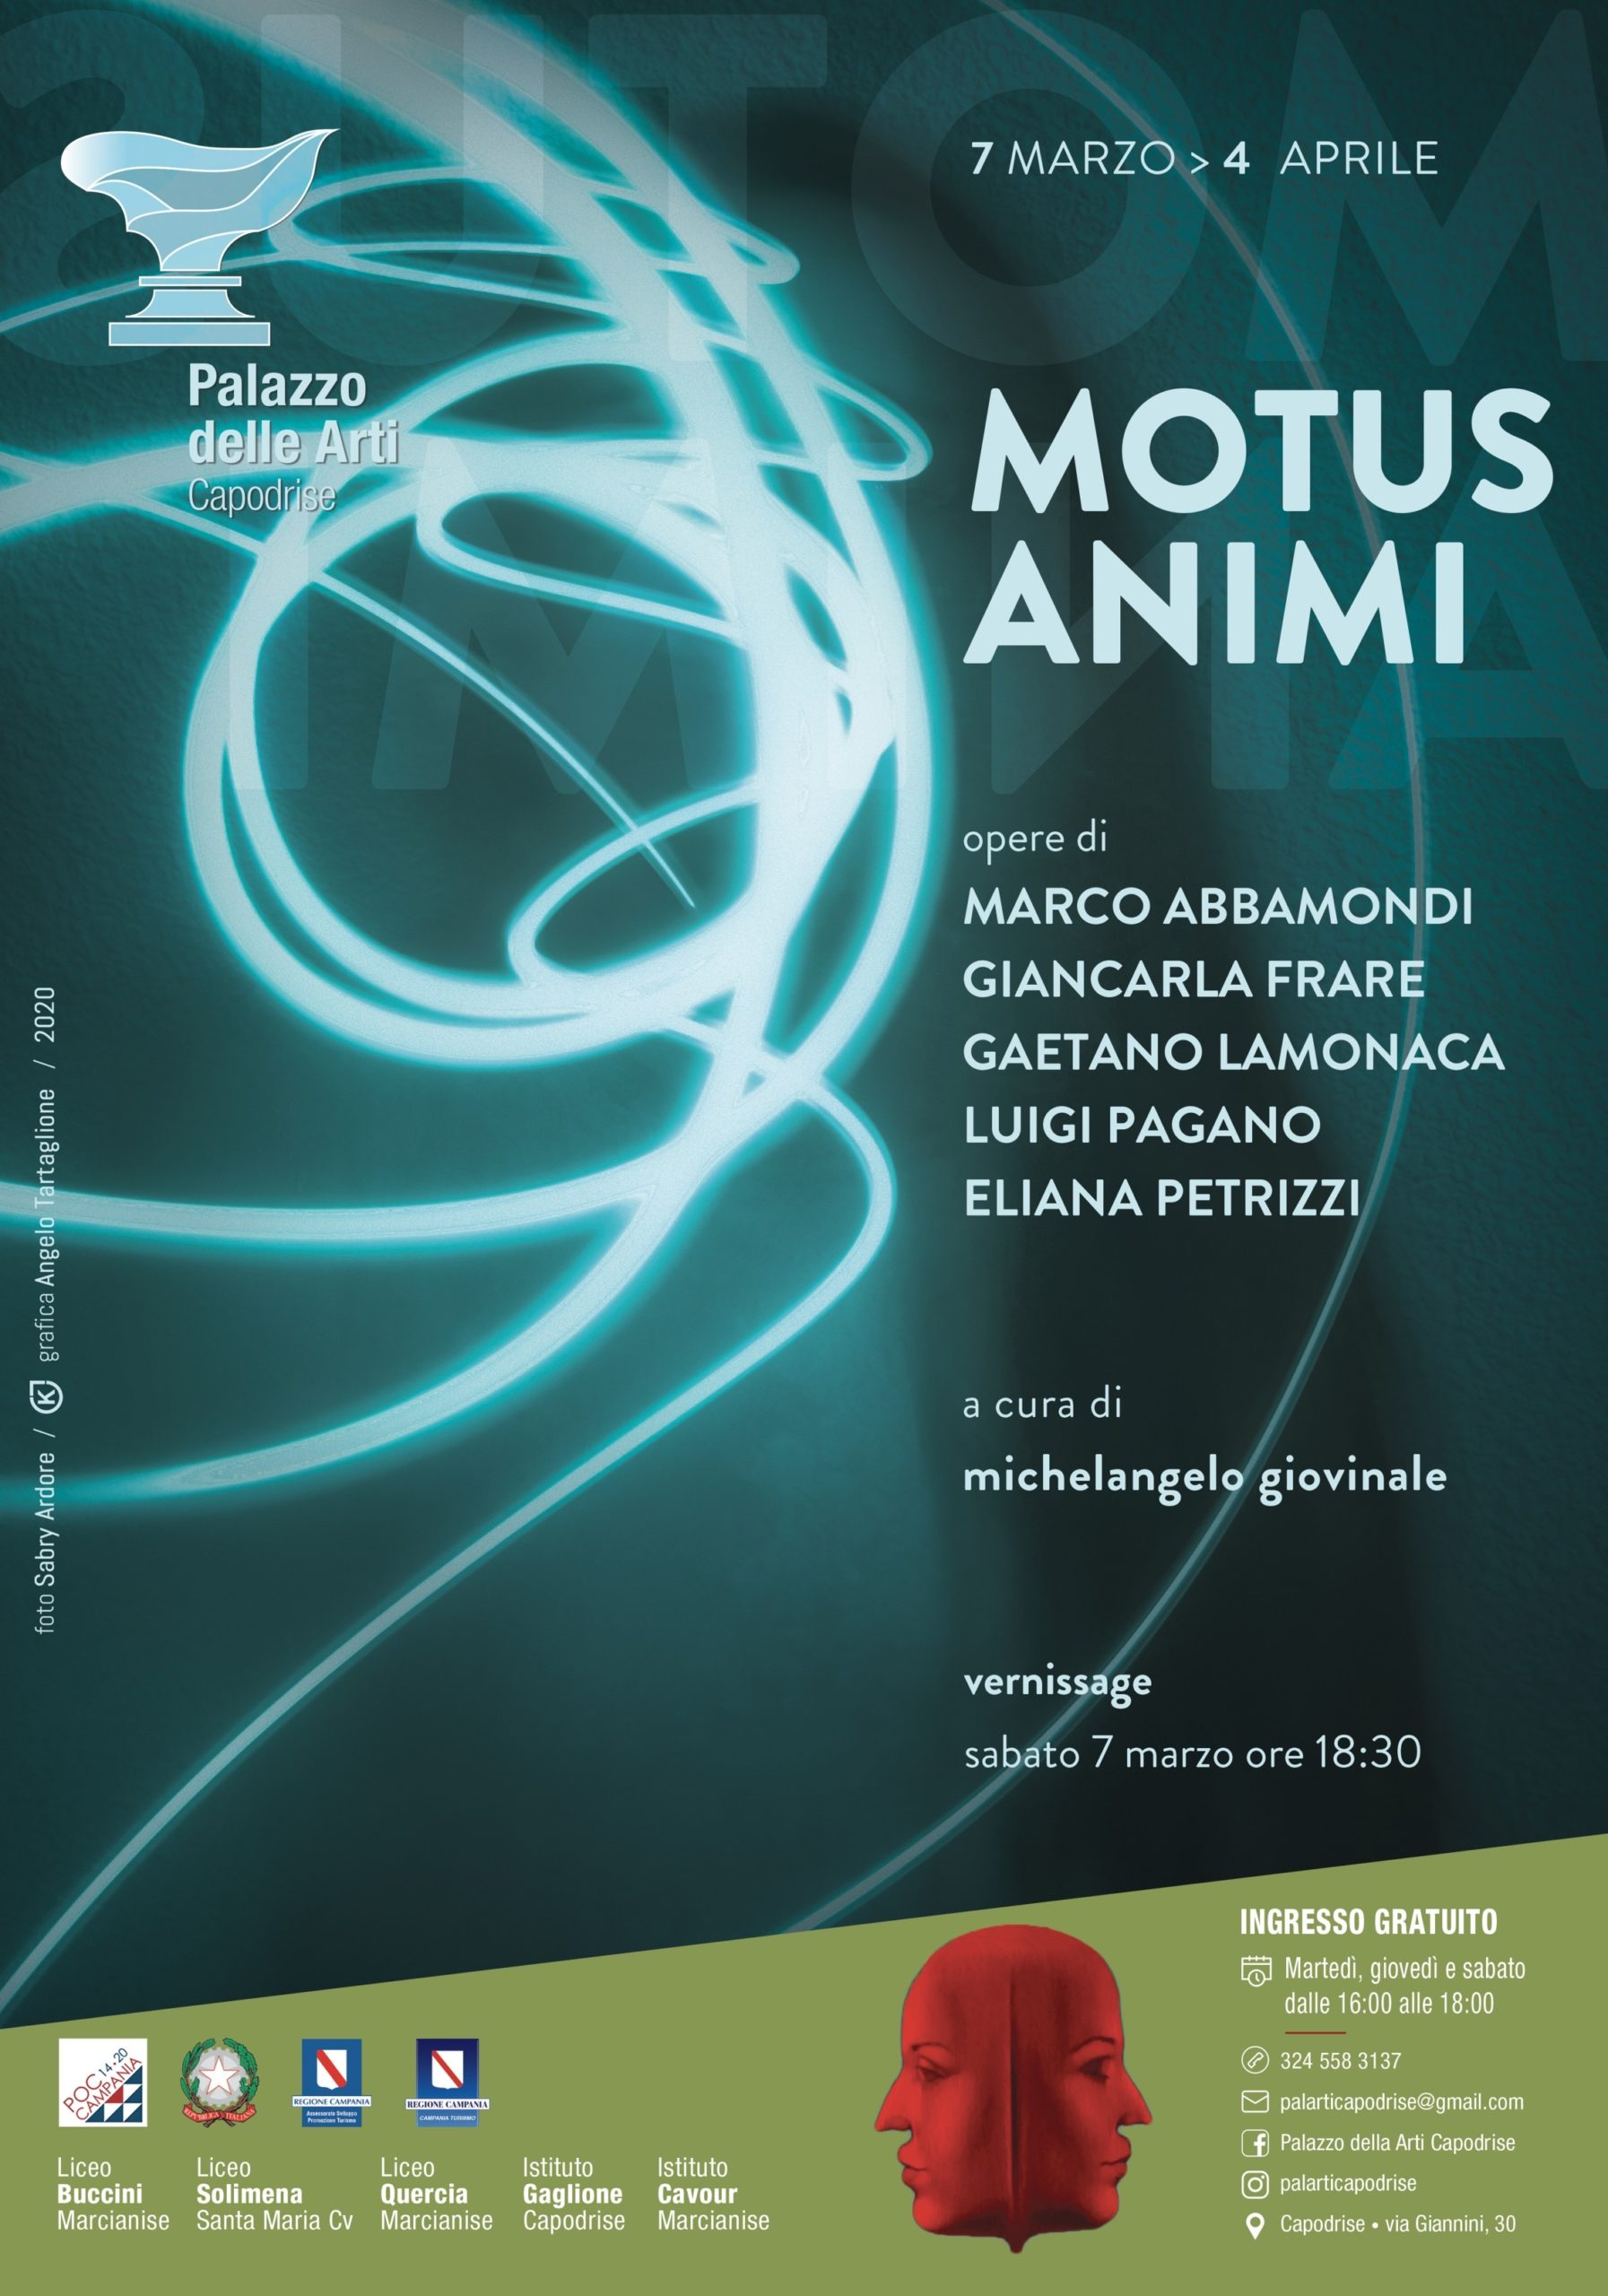 Mutus animi  opere dI Marco Abbamondi, Giancarla Frare, Gaetano Lomonaca, Luigi Pagano, Eliana Petrizzi